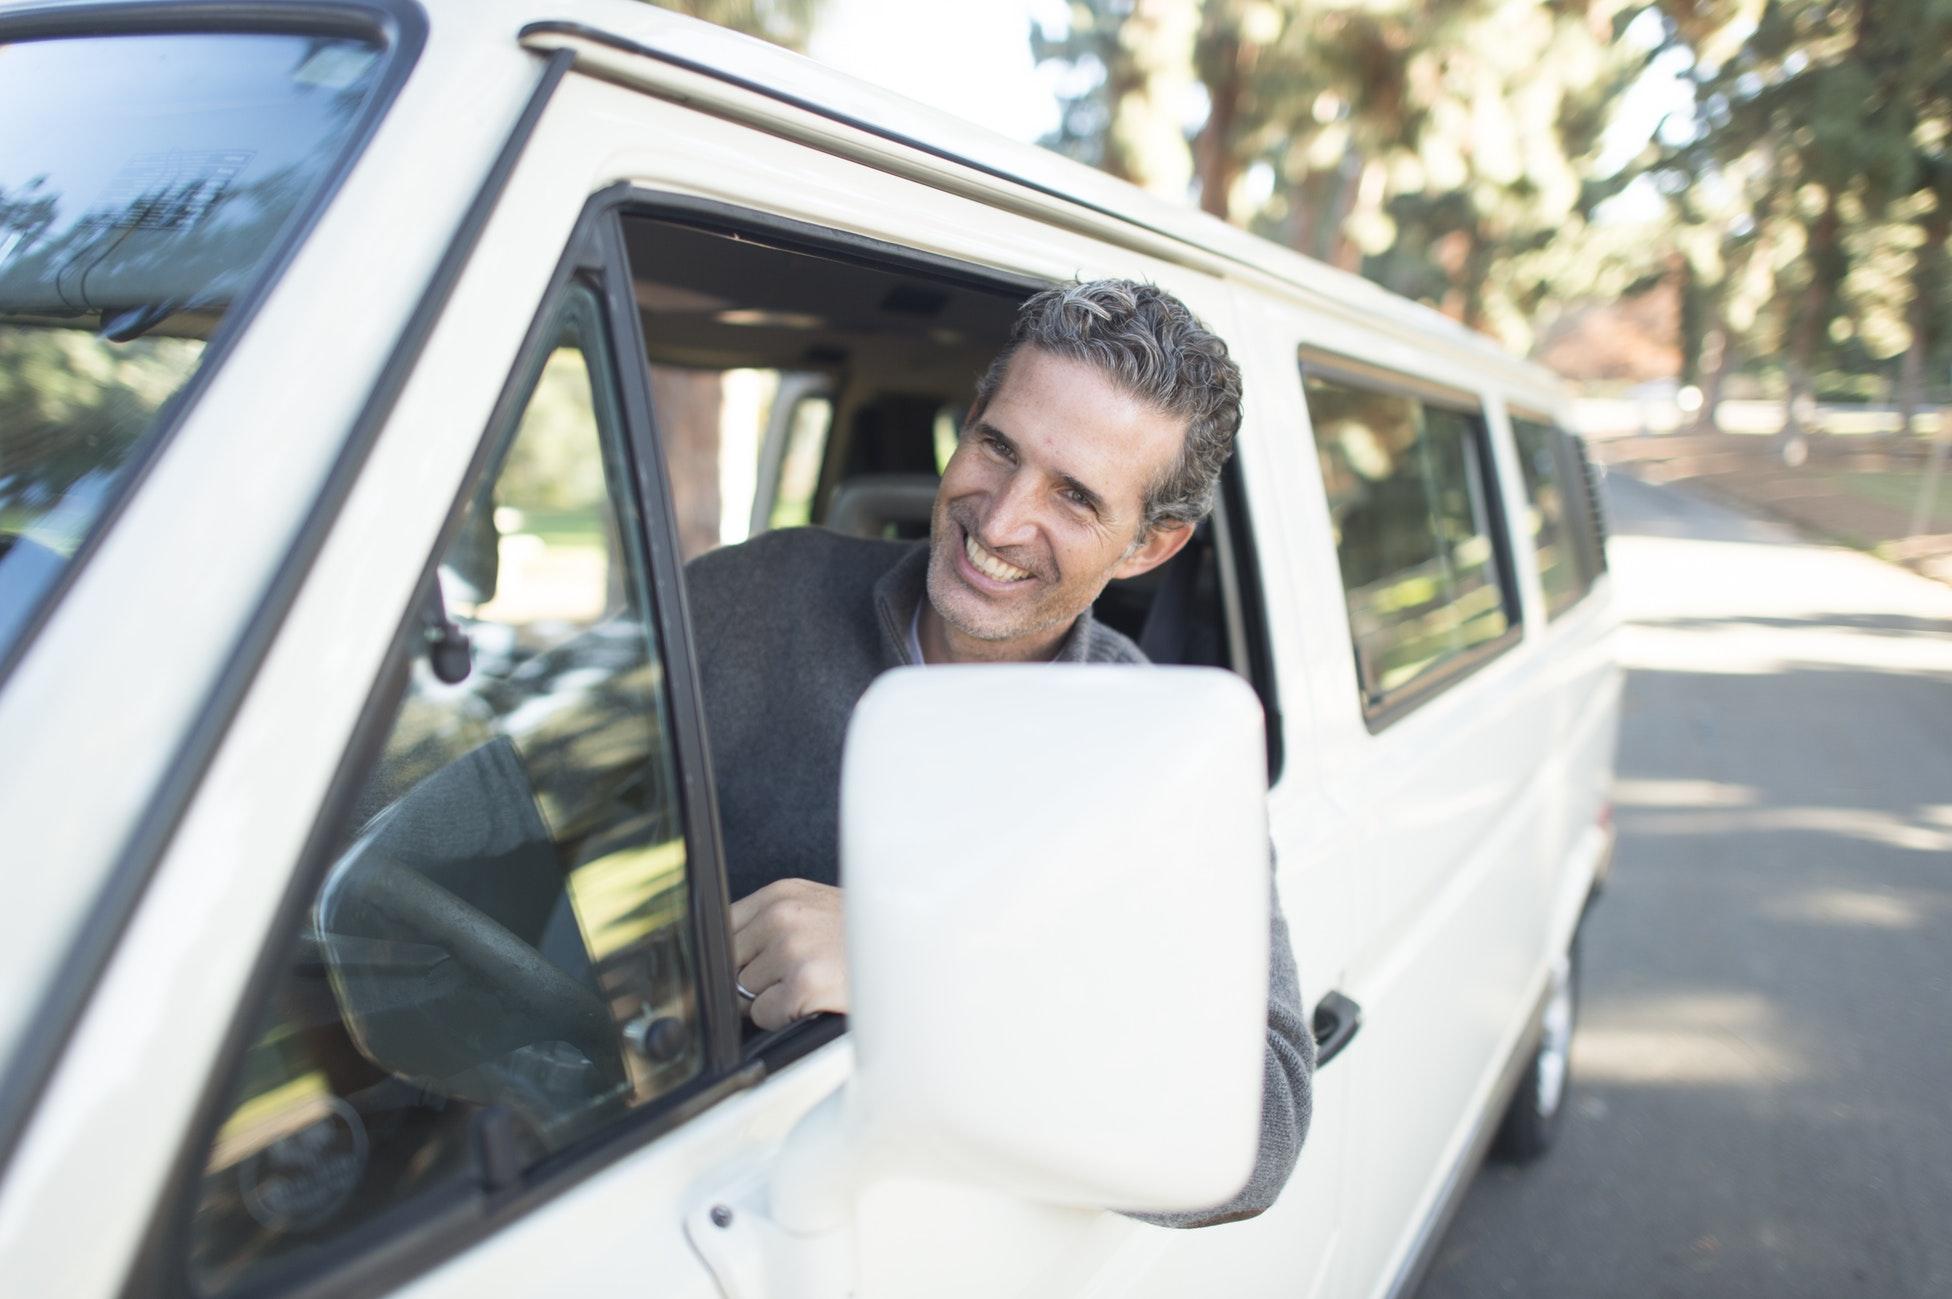 San Jose Dlpc (driver License Only) Of San Jose ...